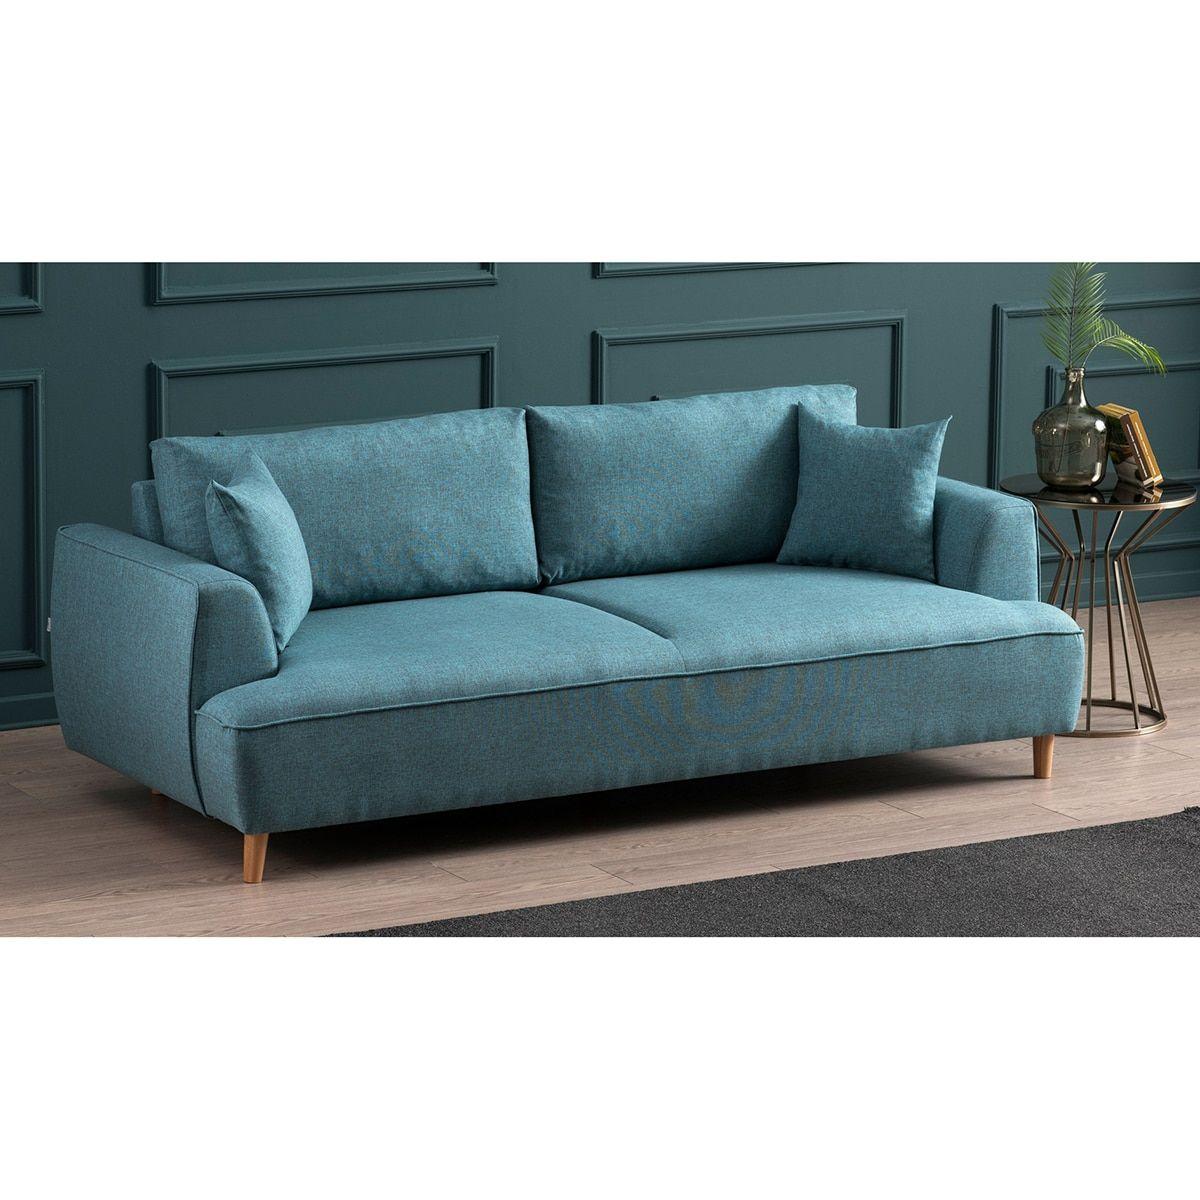 Canape Felix Bleu Turquoise Atelier Del Sofa En 2020 Canape Turquoise Bleu Turquoise Canape